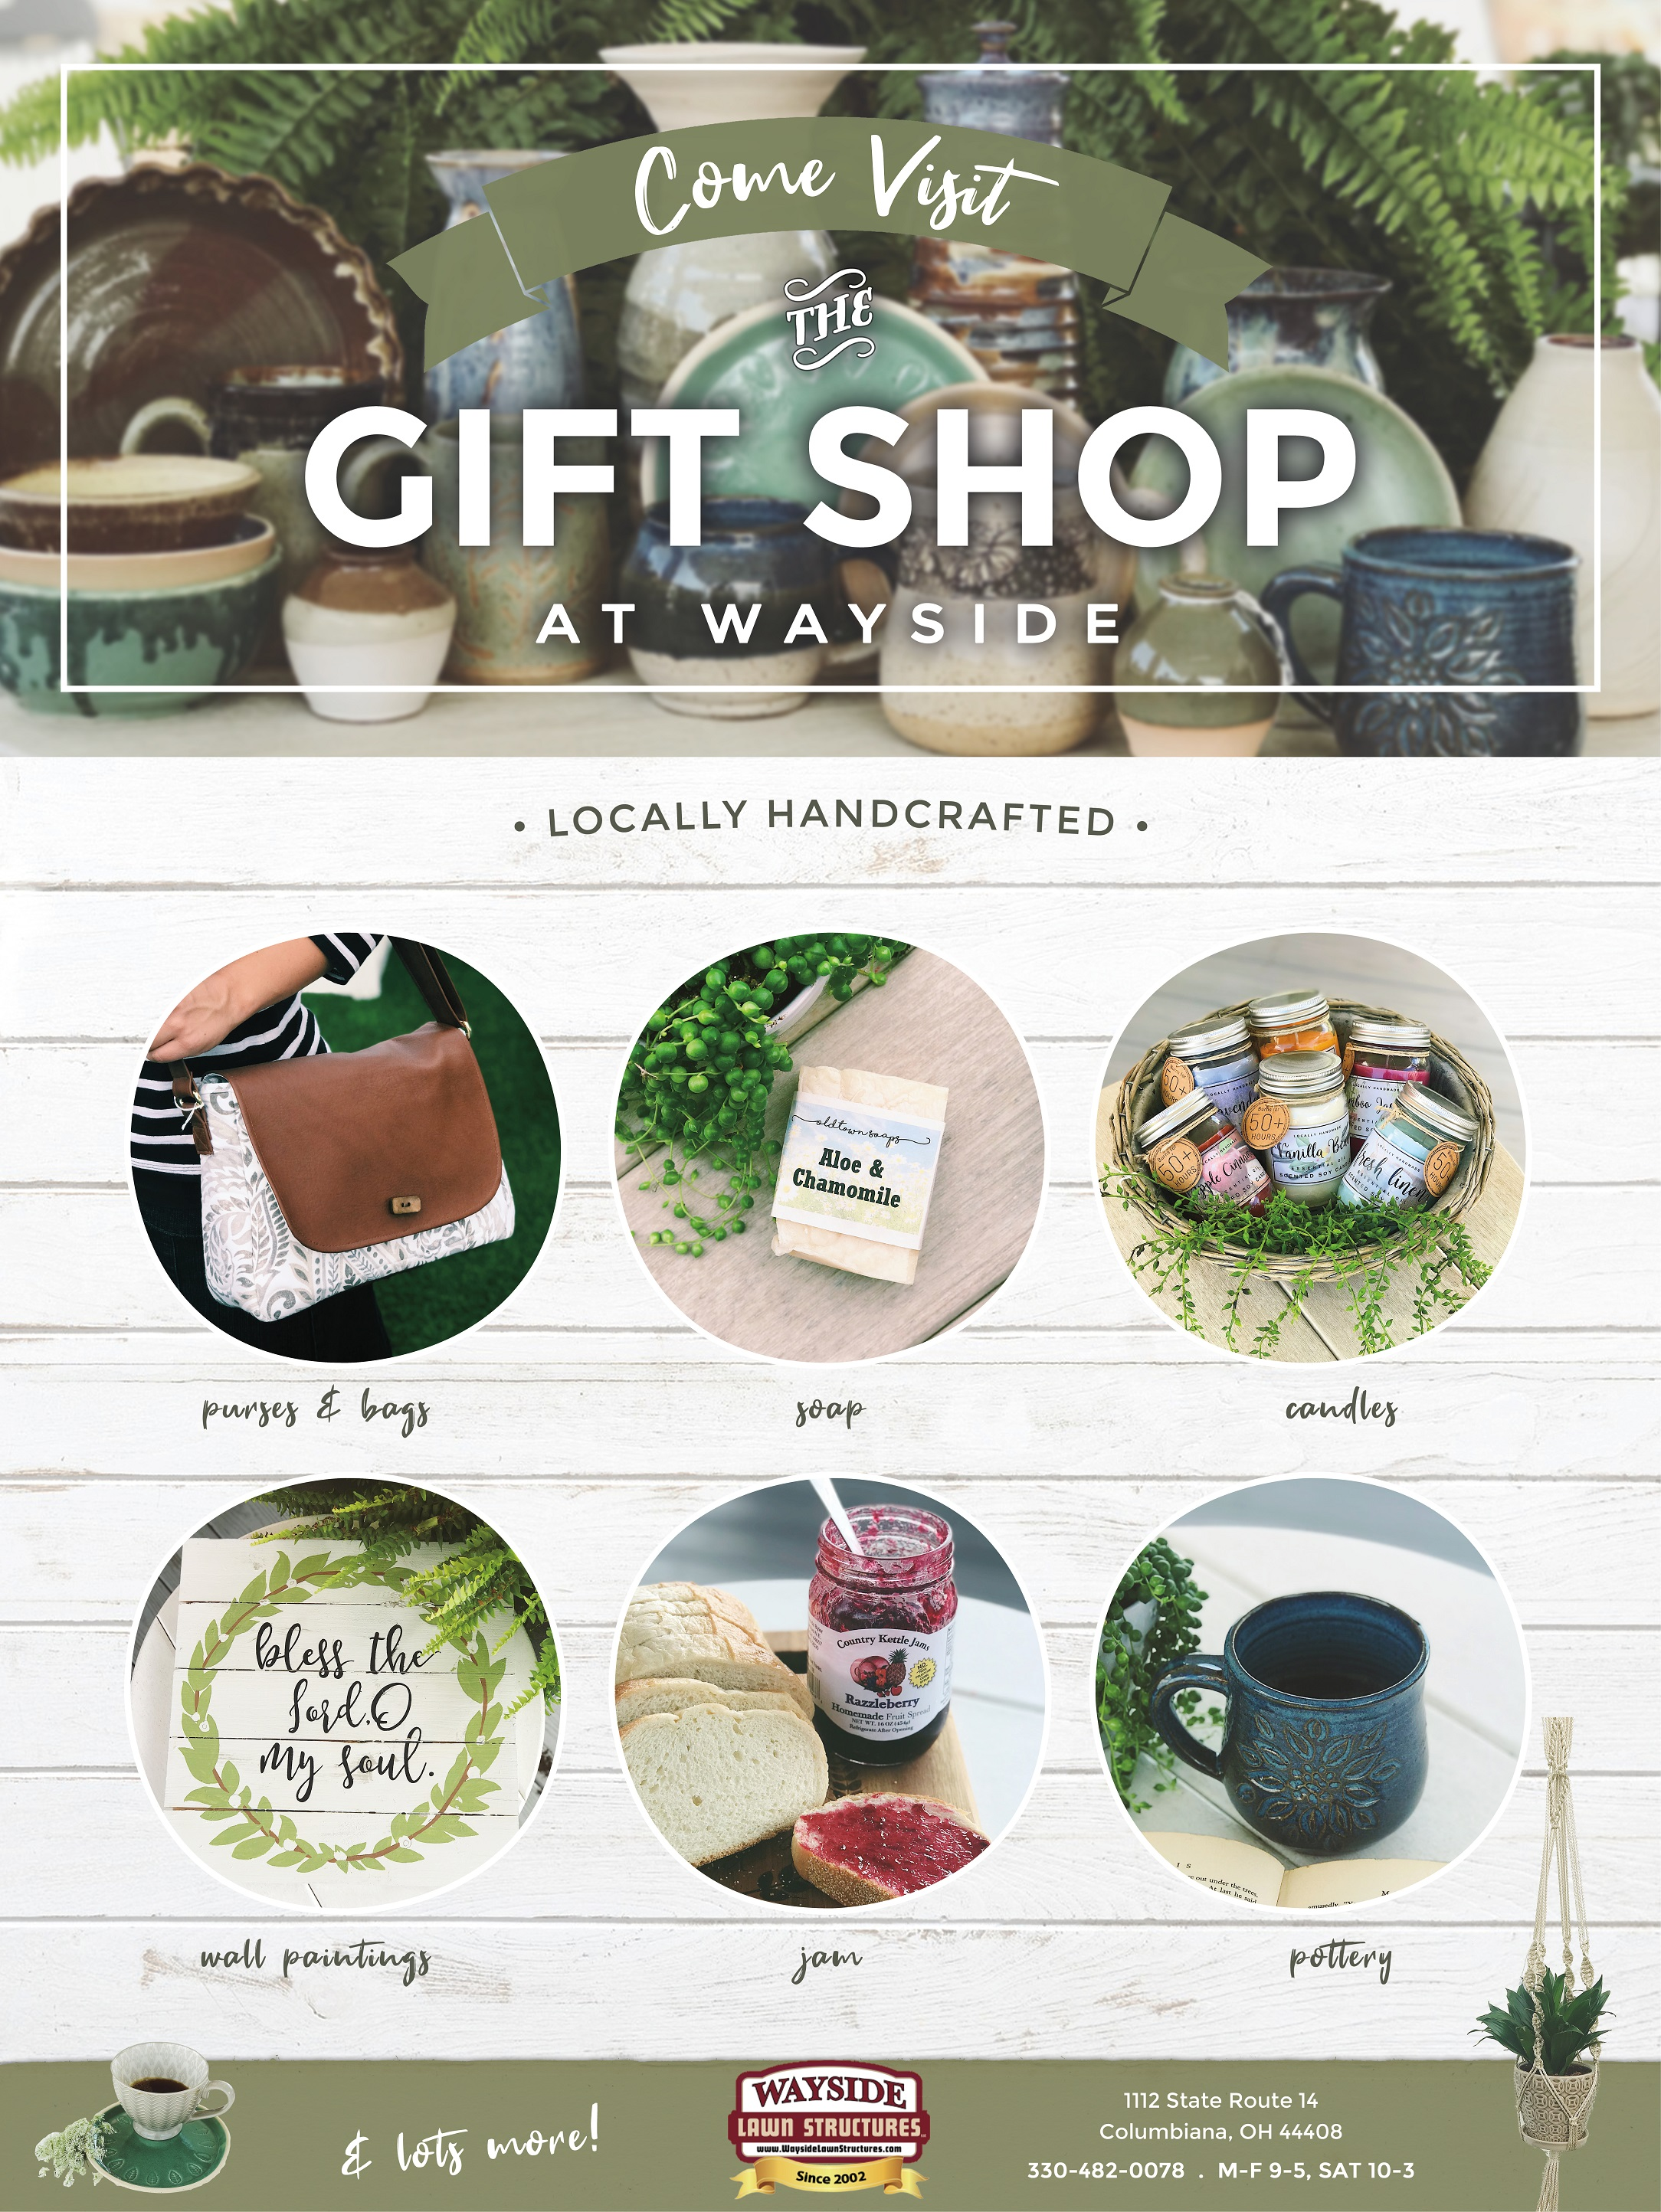 gift-shop-3x4-banner-website-1-.jpg